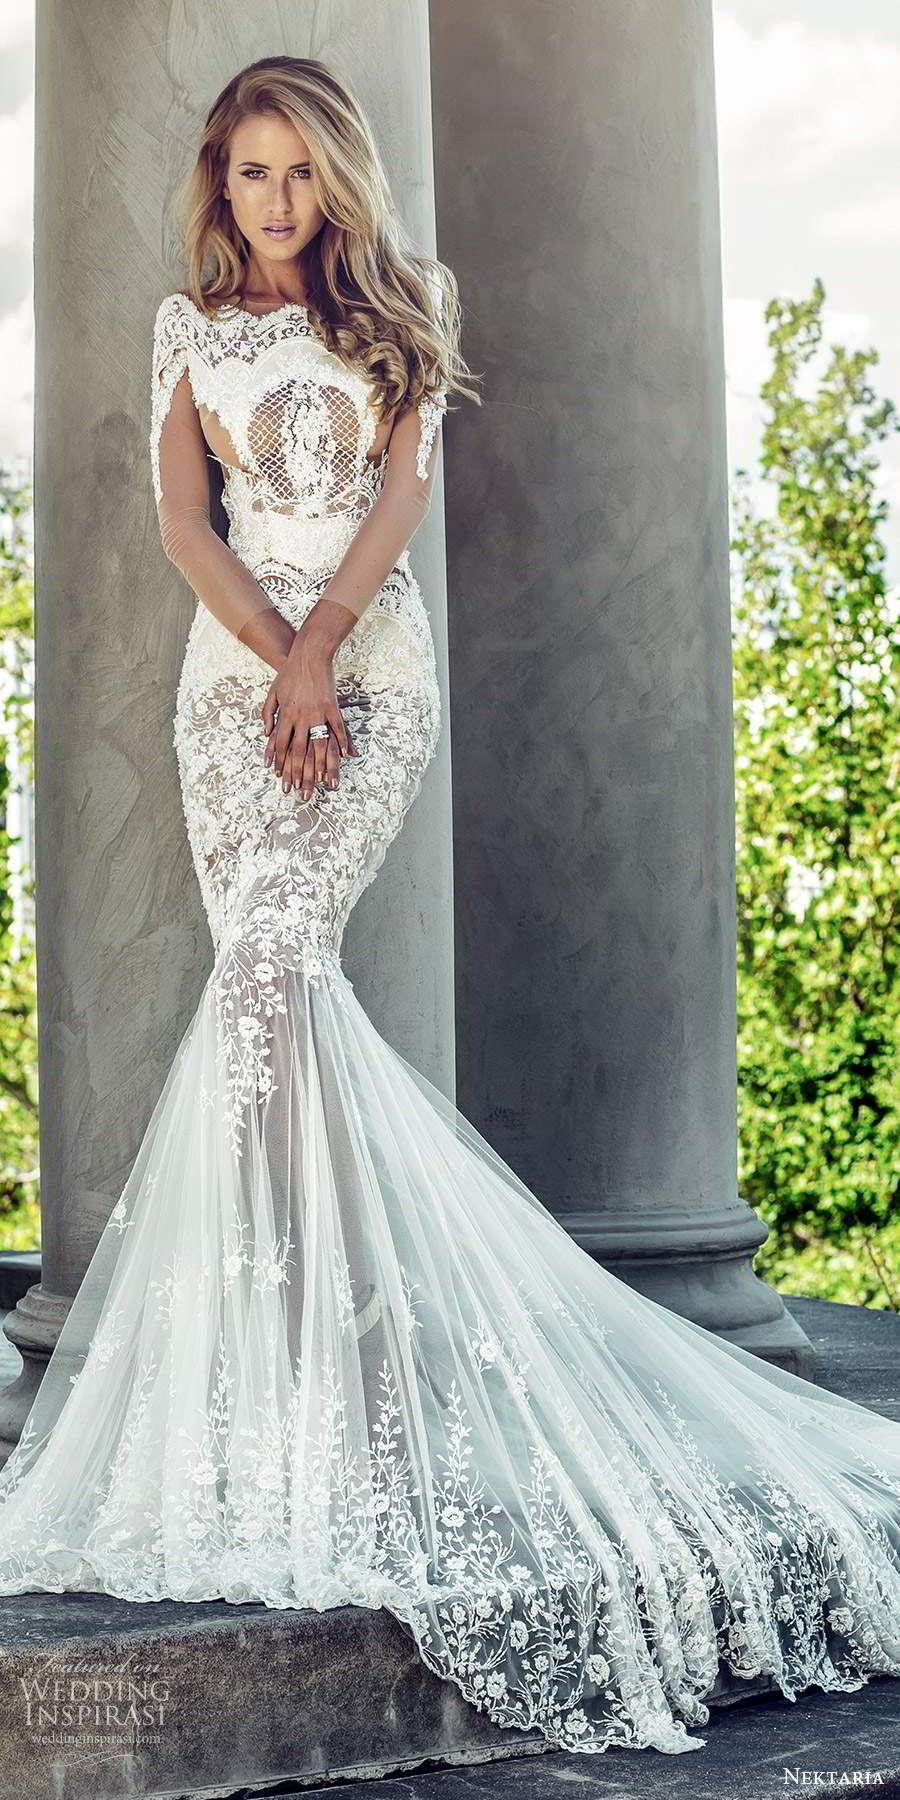 Gorgeous Nektaria Wedding Dresses Wedding Inspirasi Wedding Dress Patterns Dresses Wedding Dresses [ 1800 x 900 Pixel ]